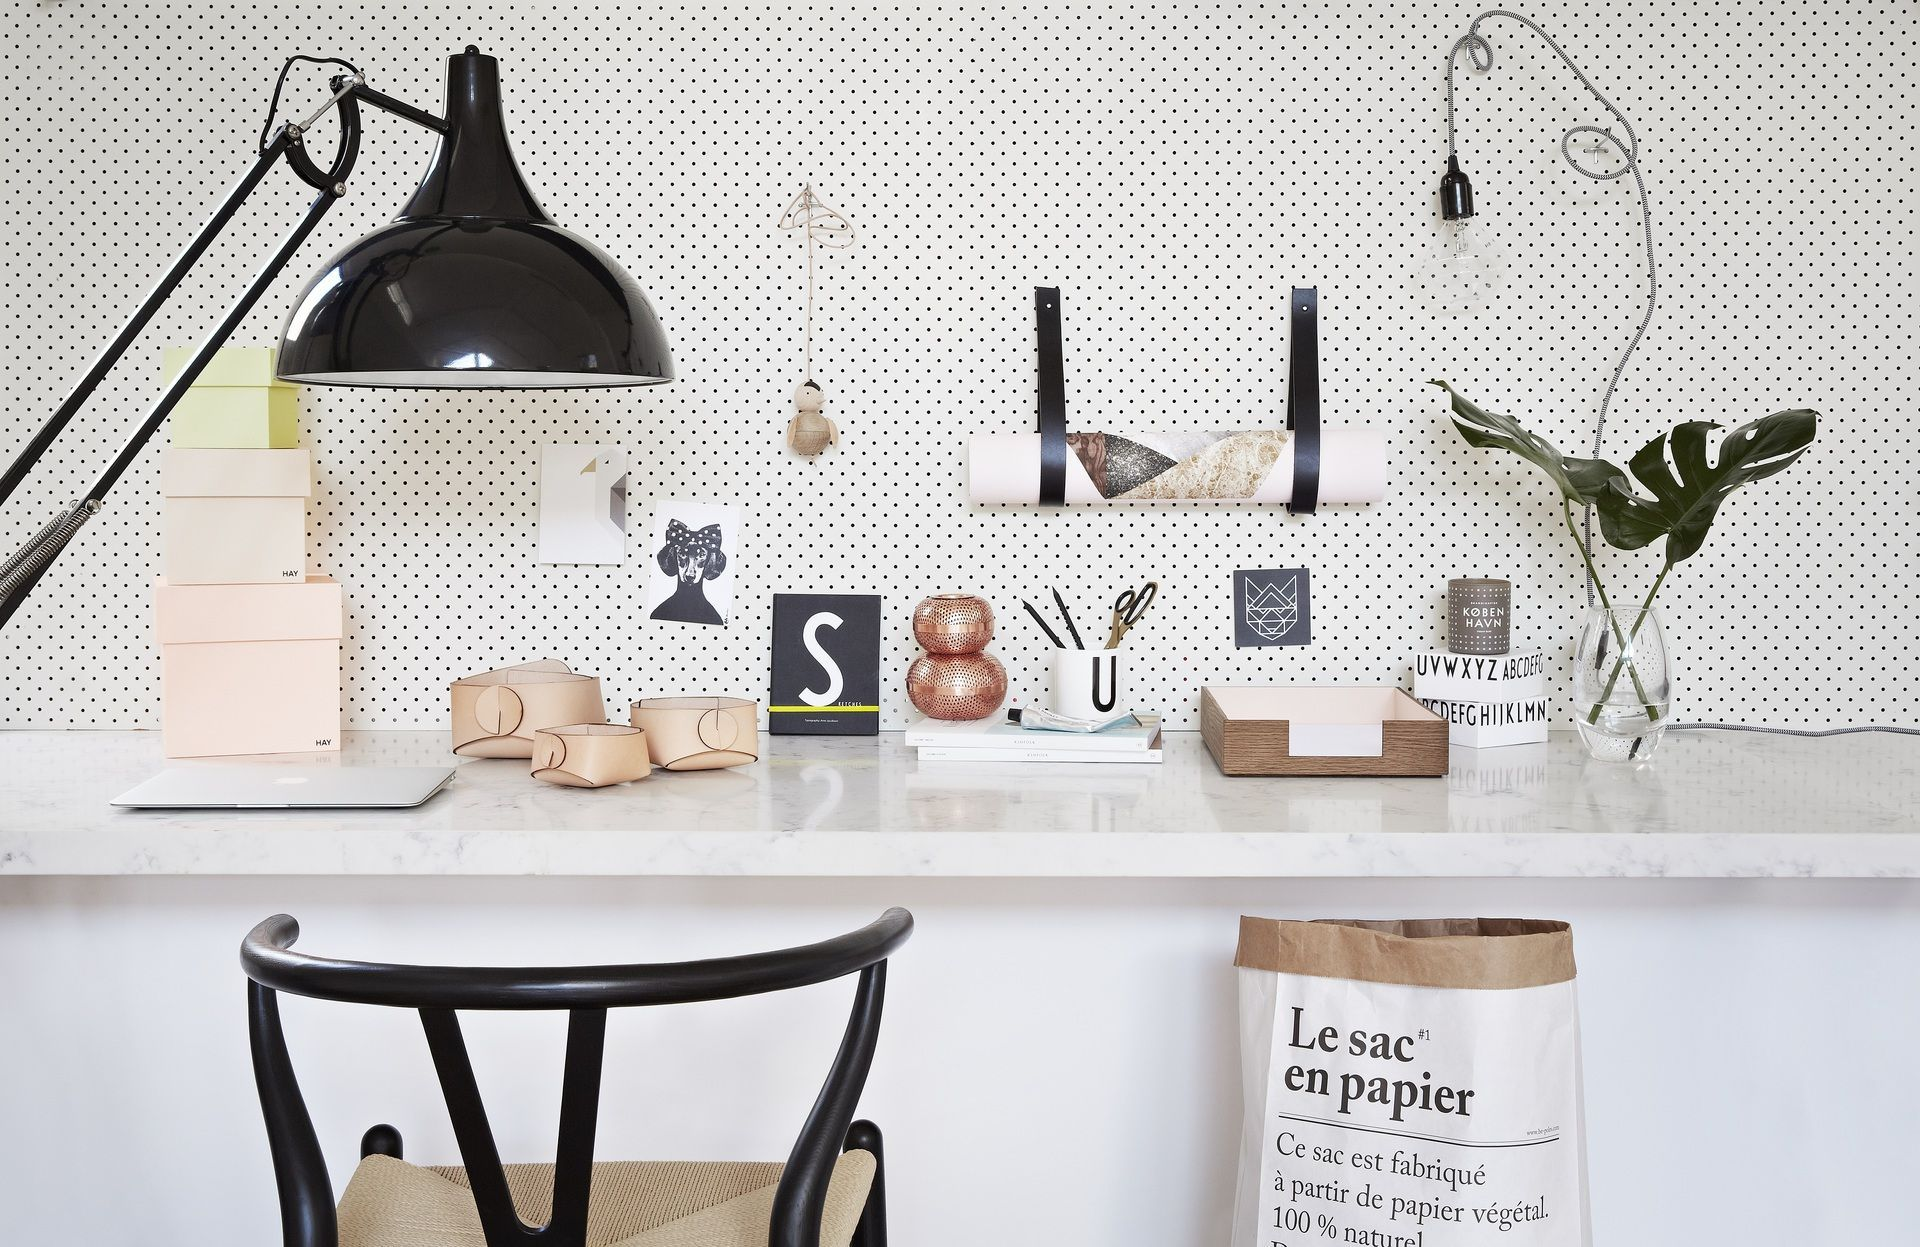 Zehn Einrichtungs Ideen Fur Das Home Office Bauemotion De